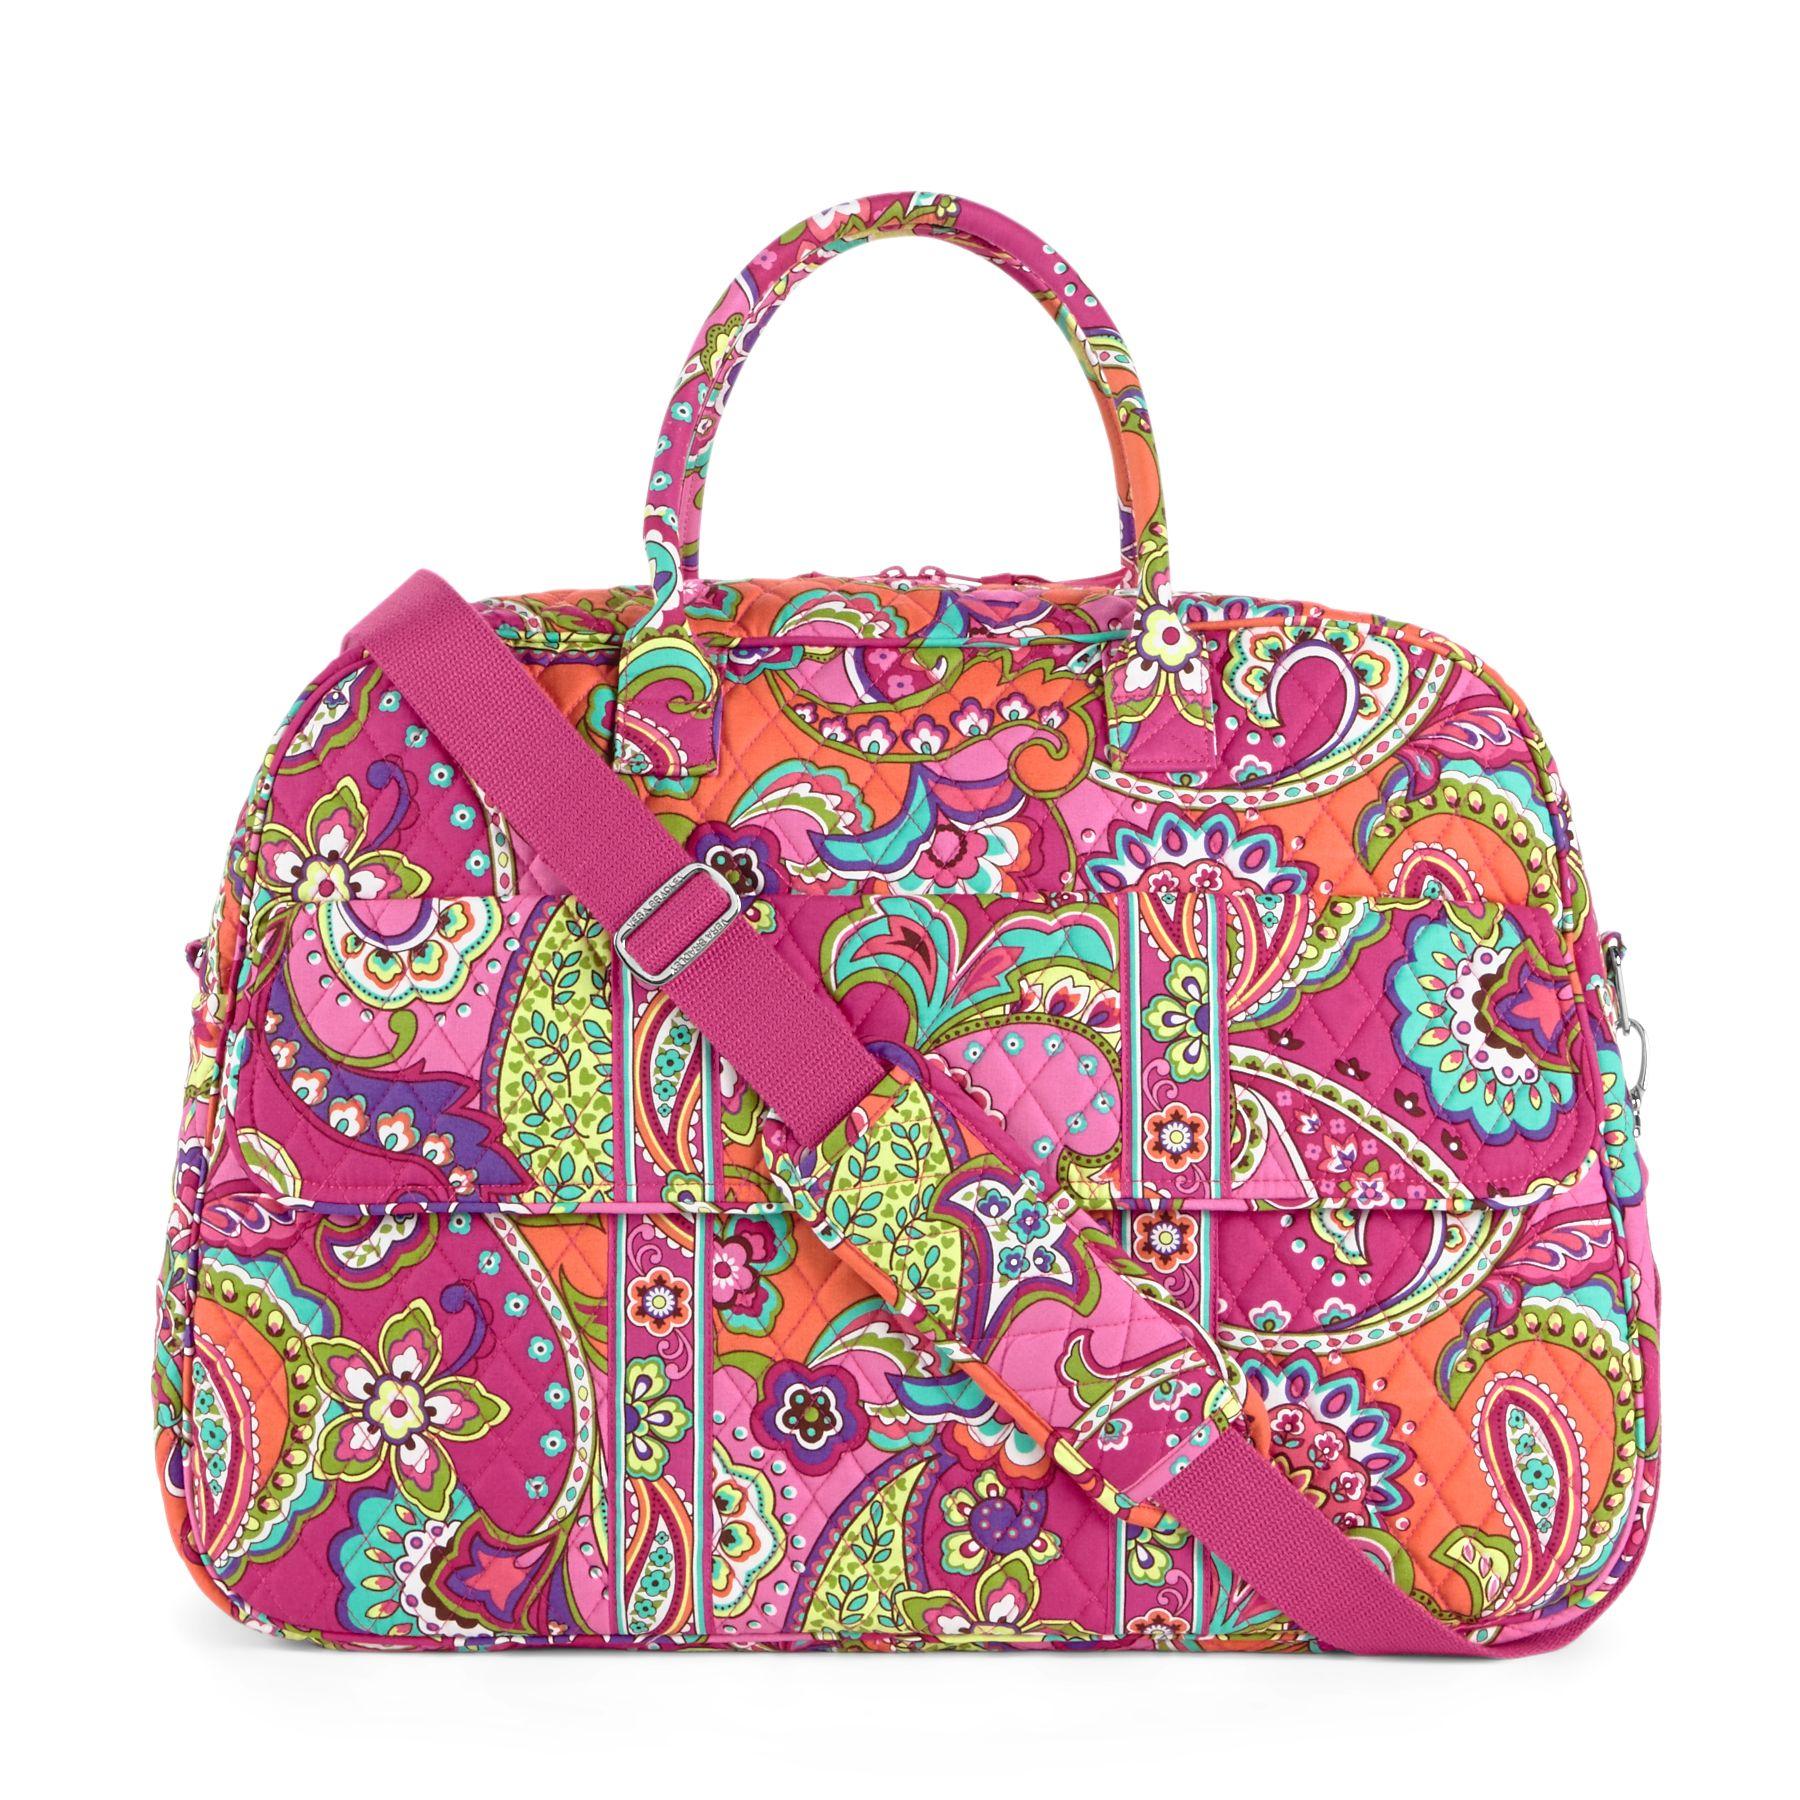 Vera Bradley Grand Traveler Bag in Pink Swirls